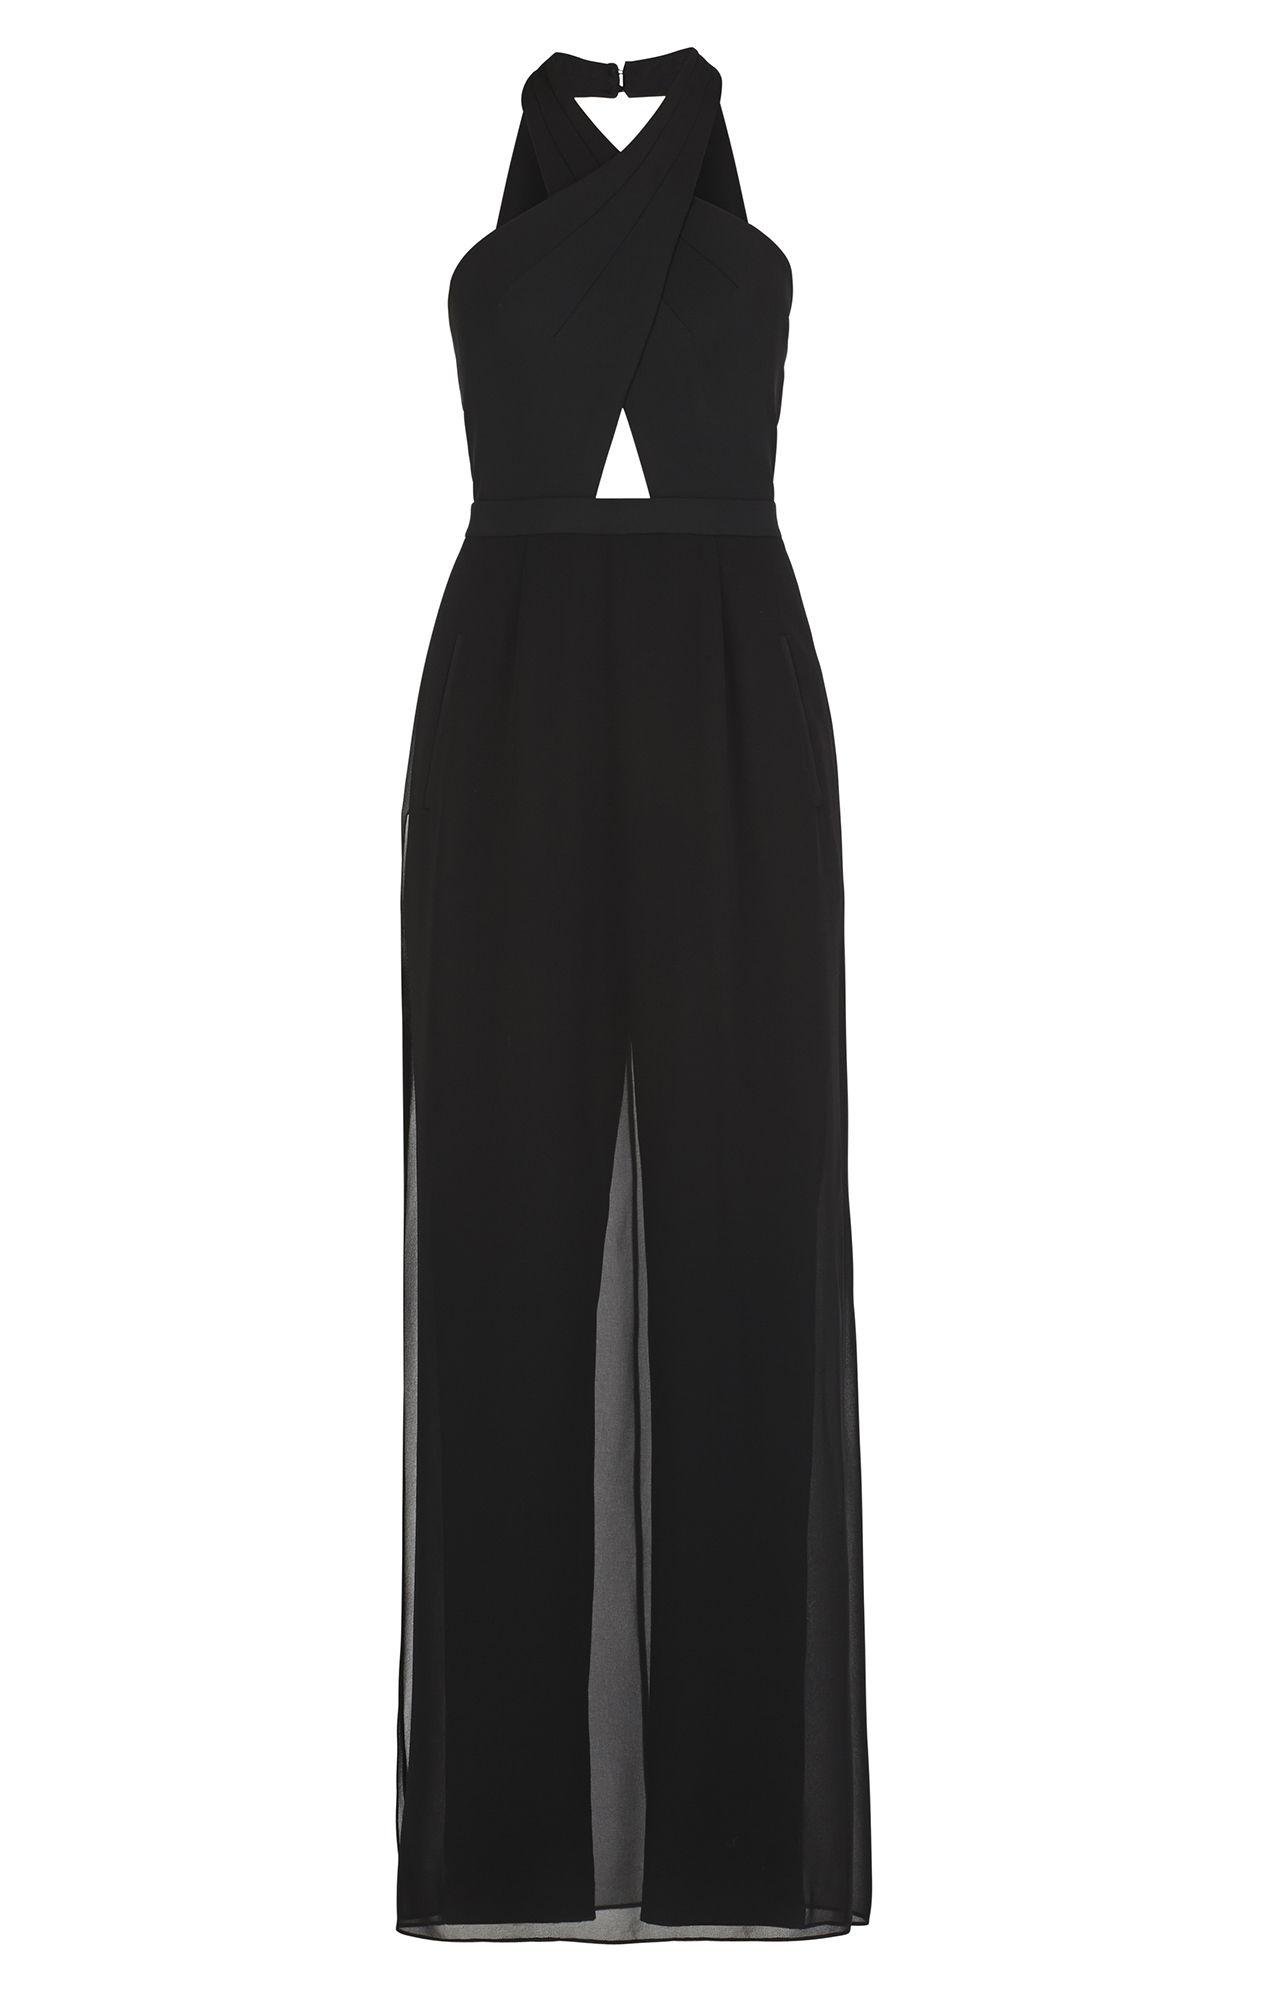 c99a12e32621 Lyst - BCBGMAXAZRIA Josselyn Halter Top Jumpsuit in Black